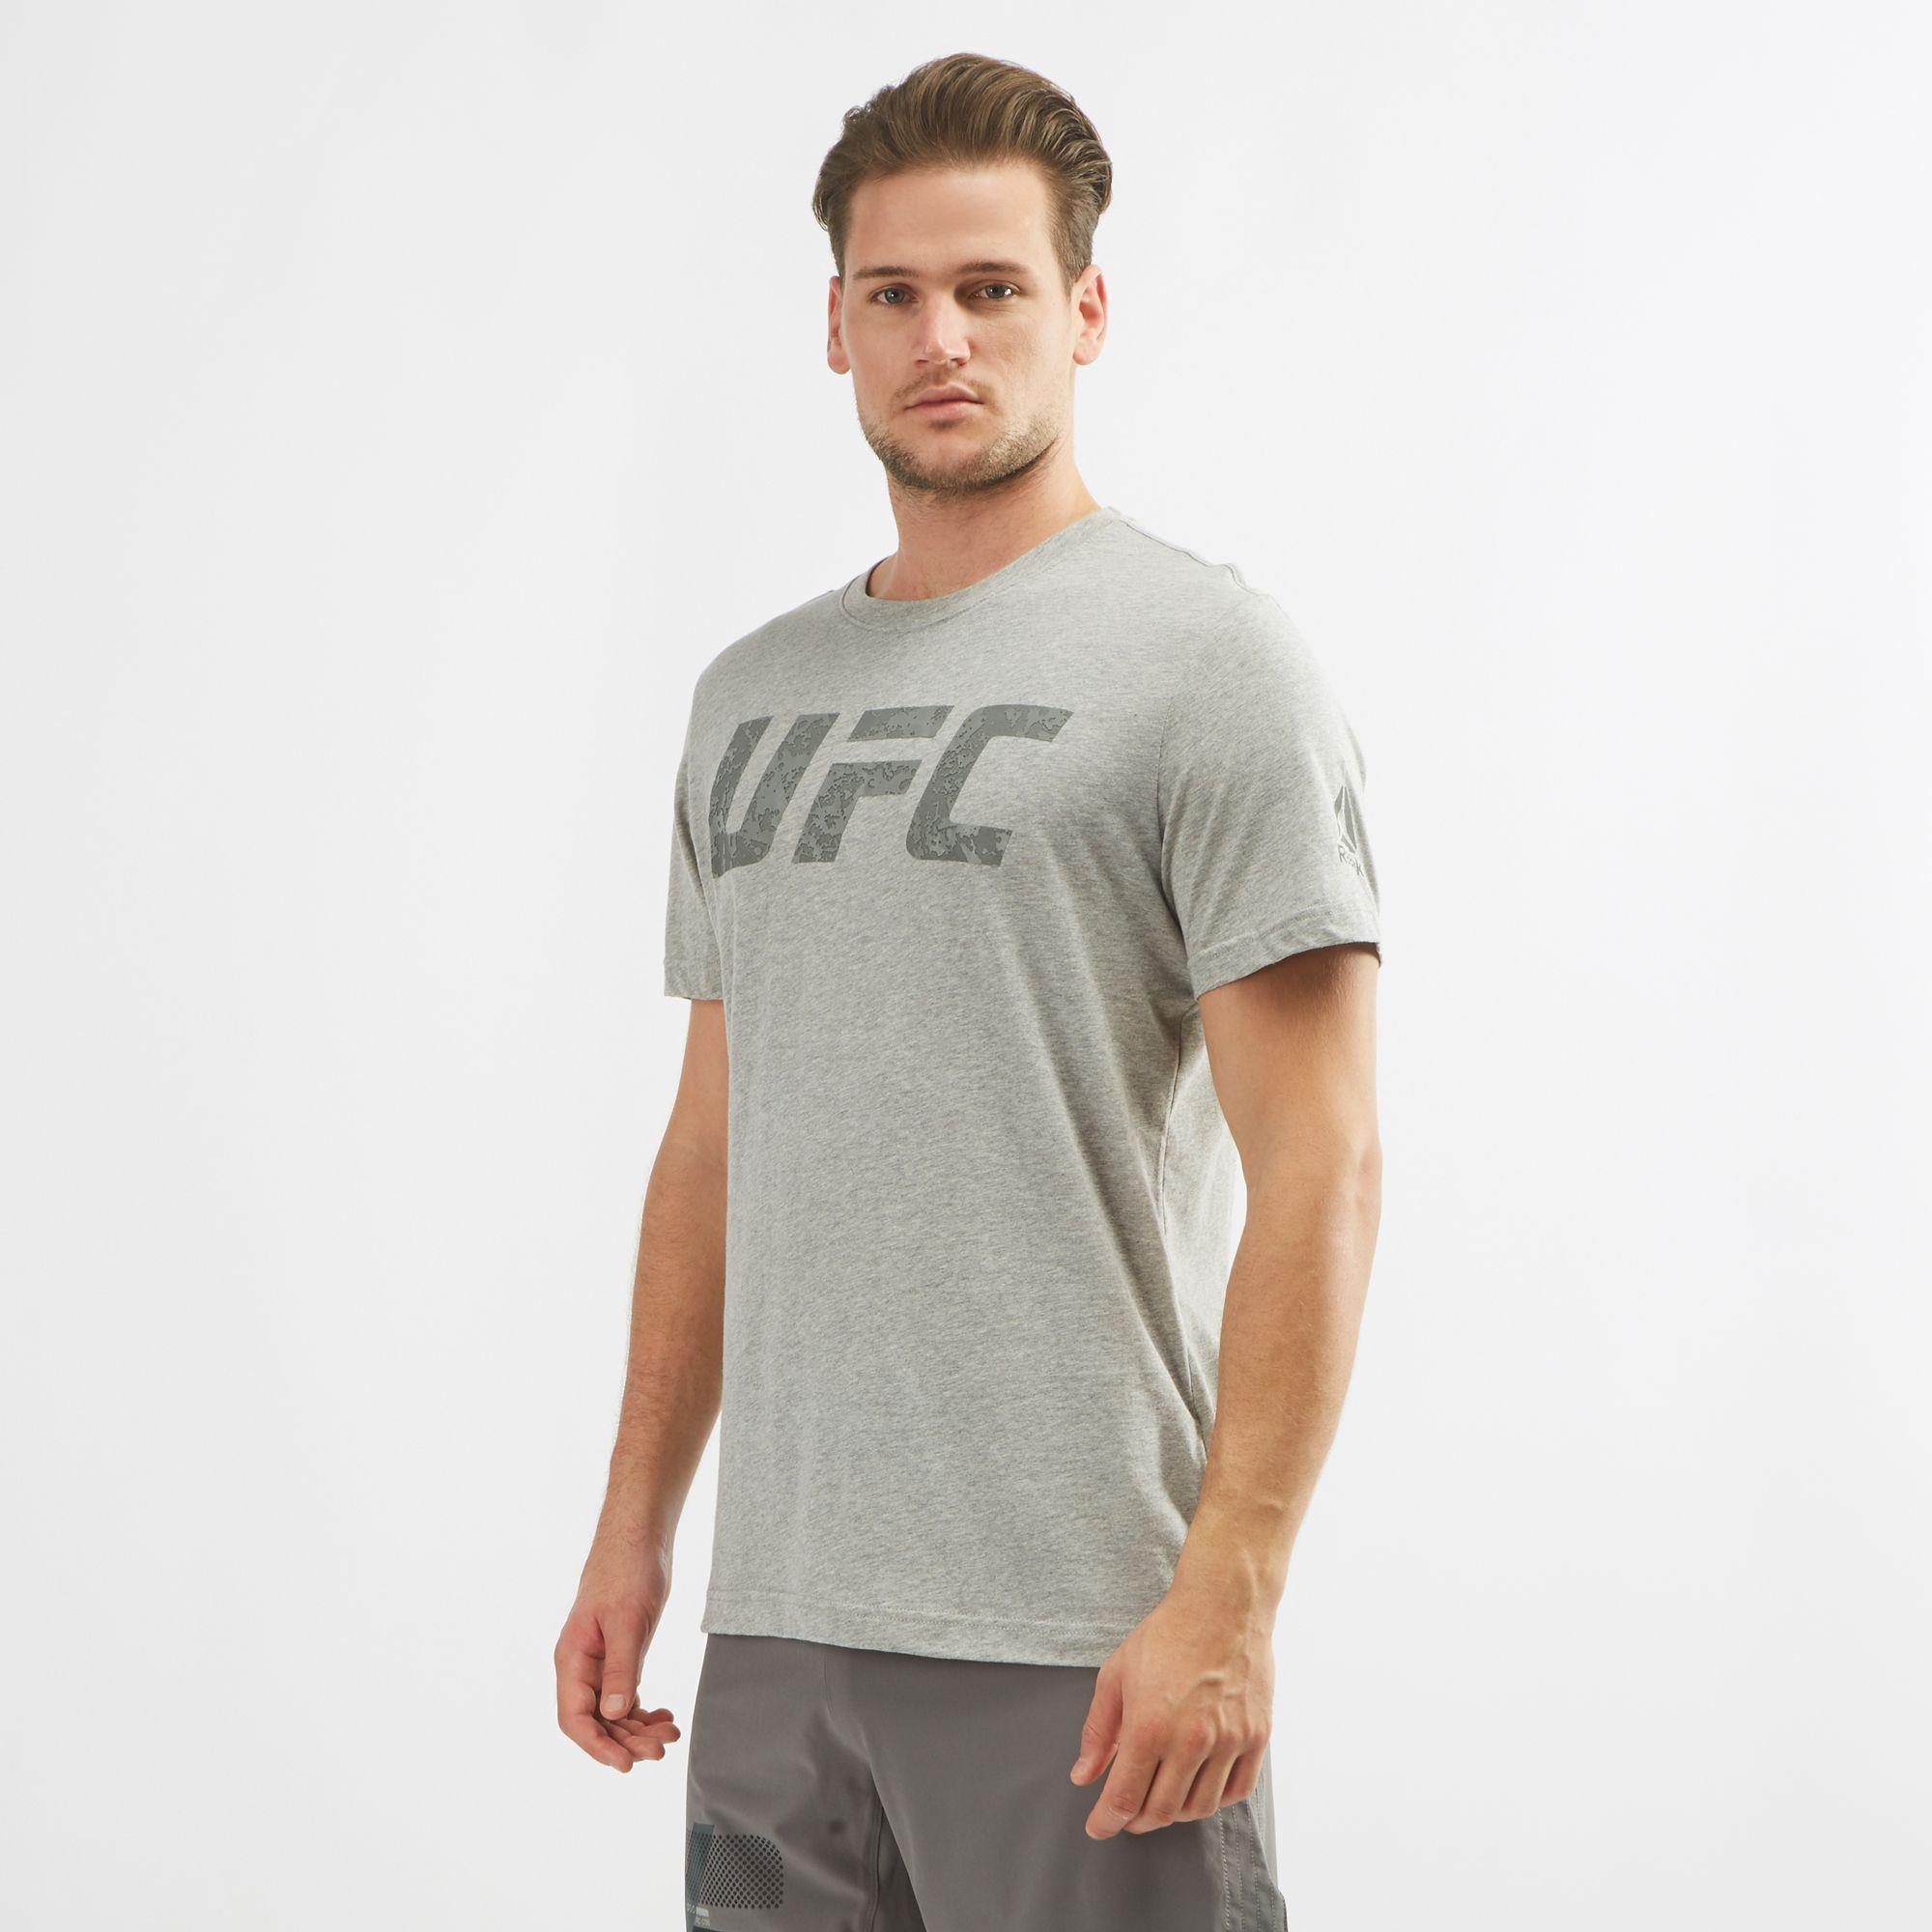 Reebok UFC Logo Tee